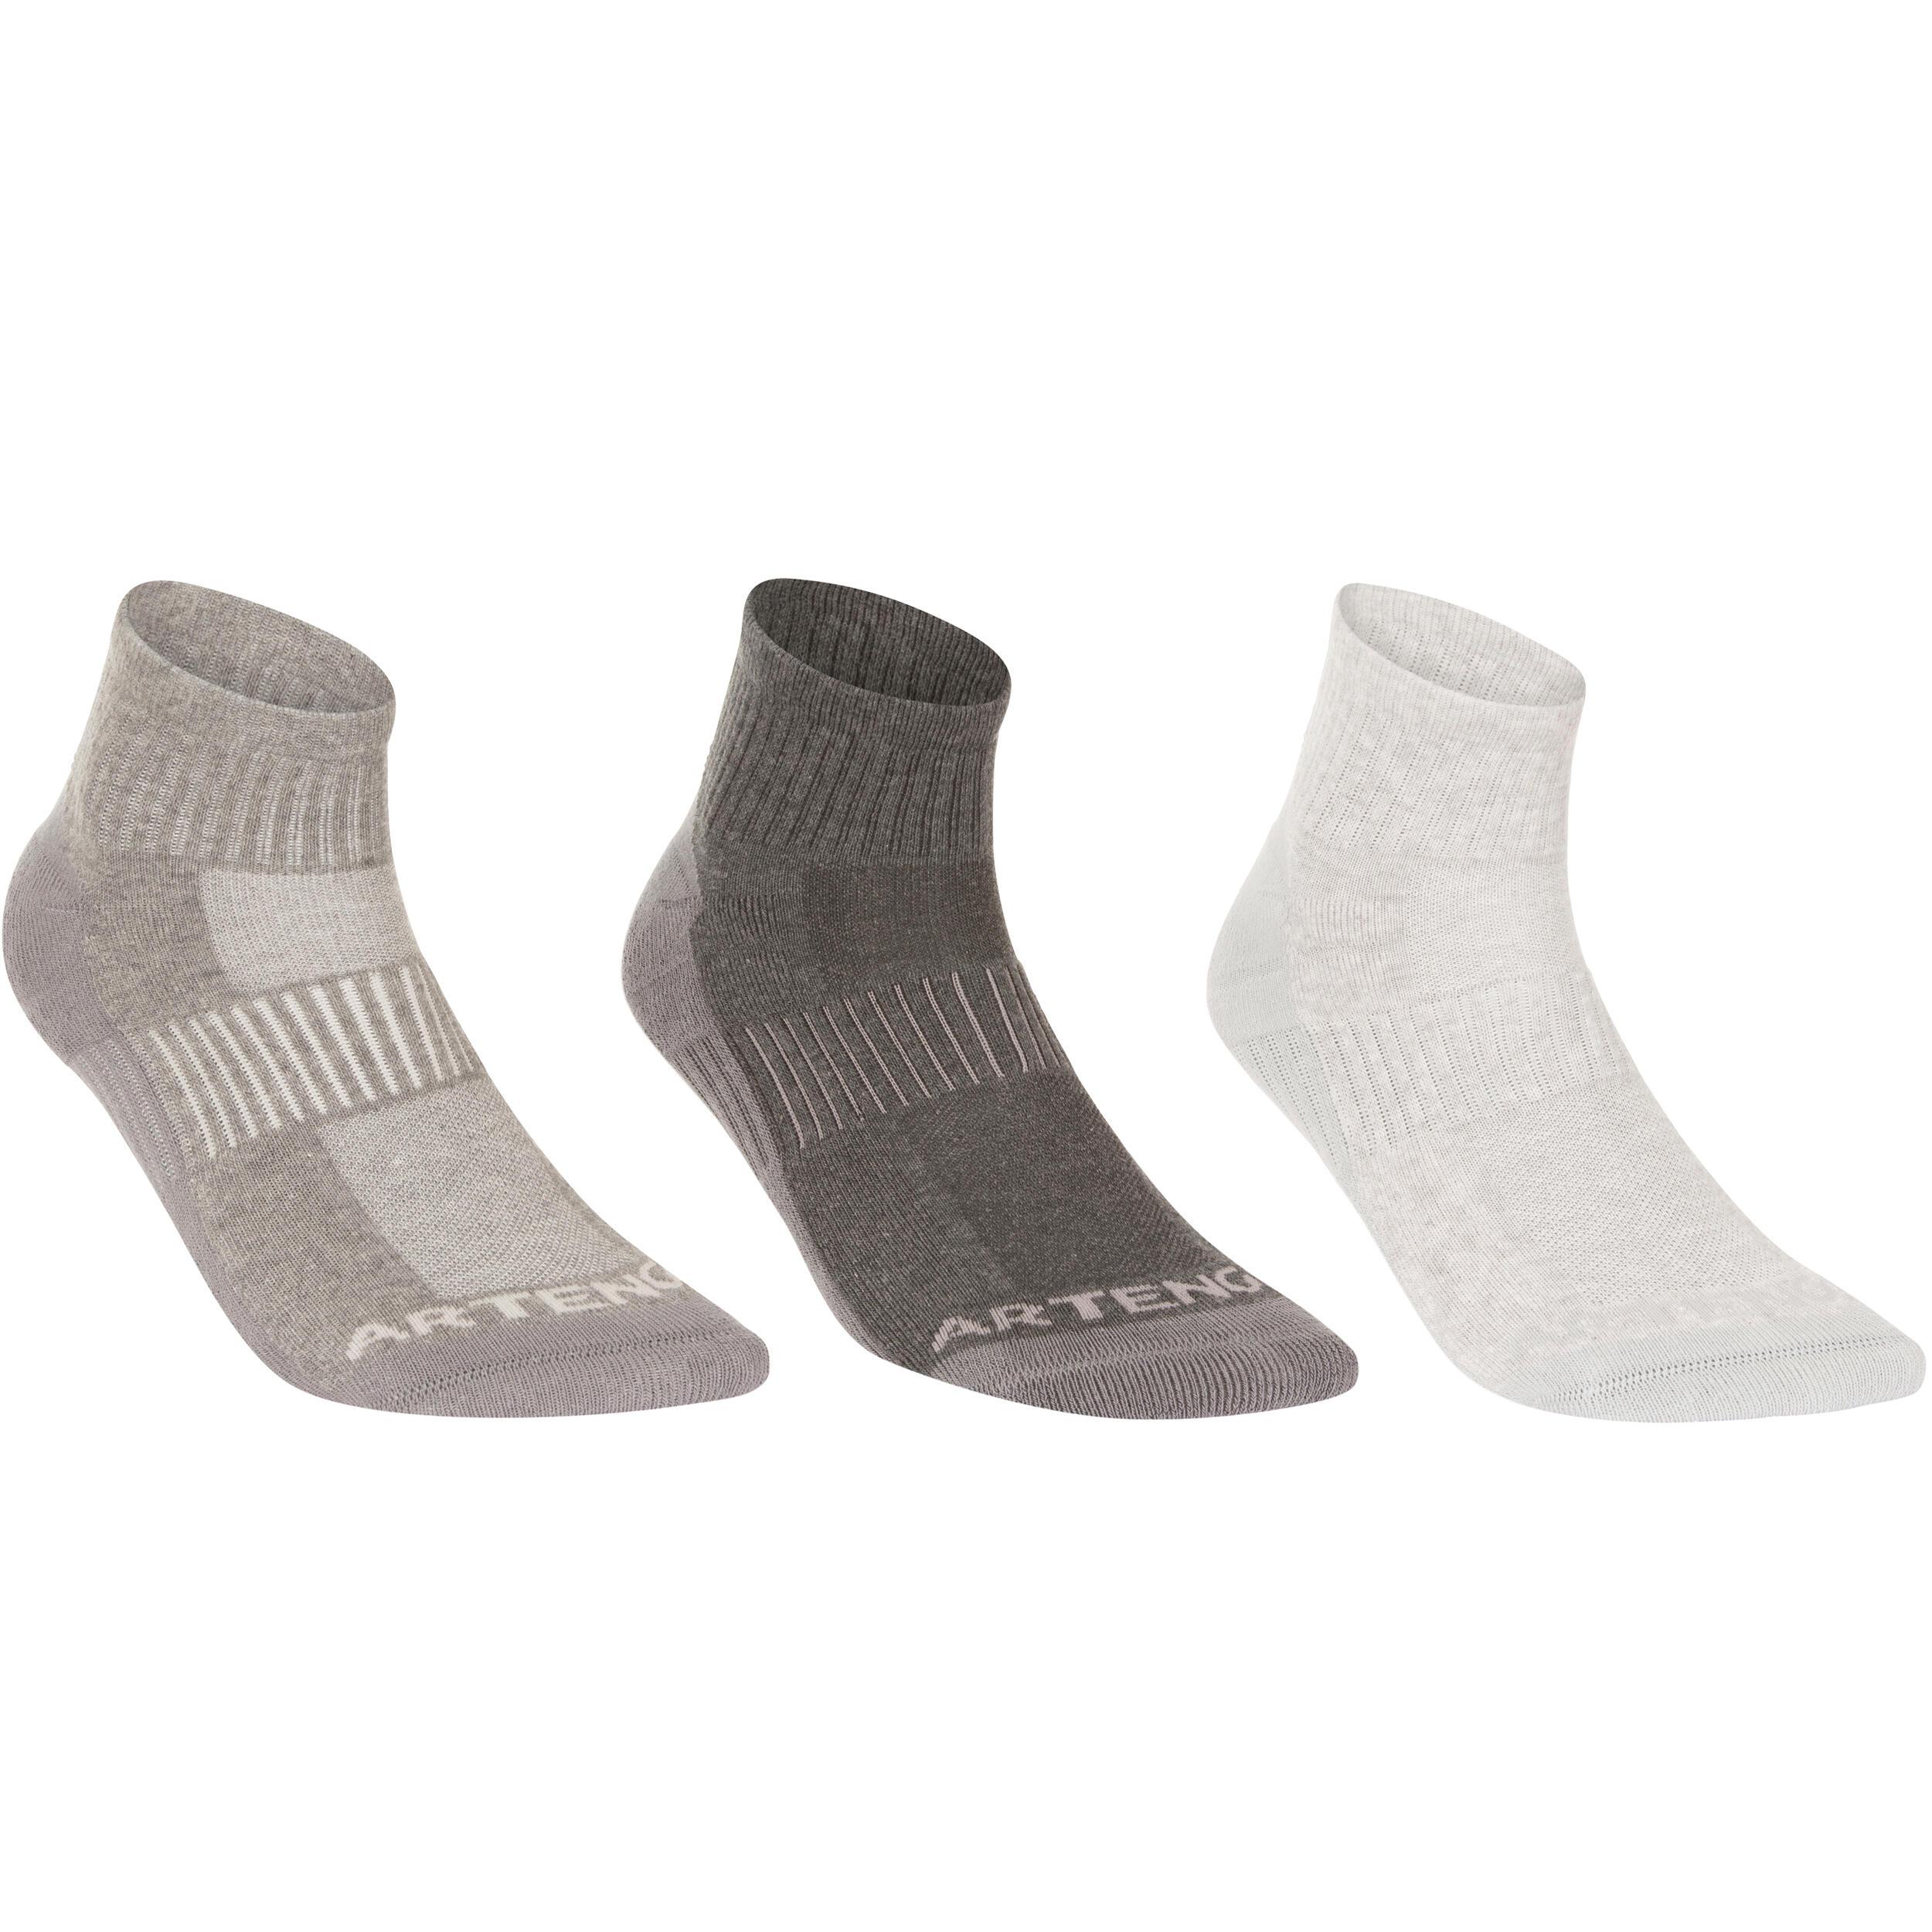 Socks RS 500 Adult Mid Tri-Pack - Mottled Grey